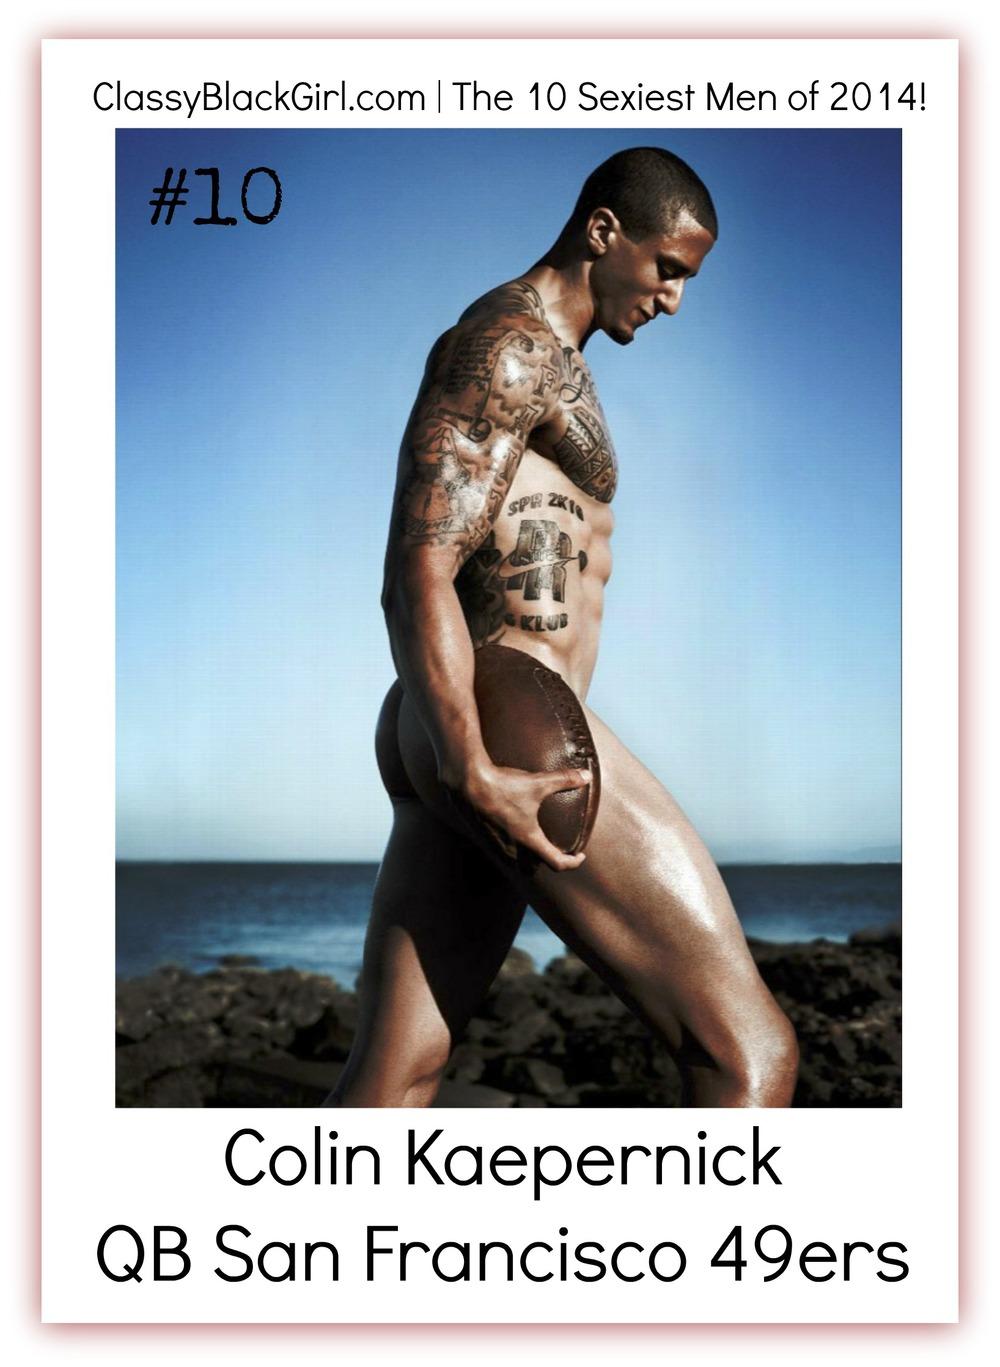 Colin Kaepernick Classy Black Girl 10 Sexiest men of 2014